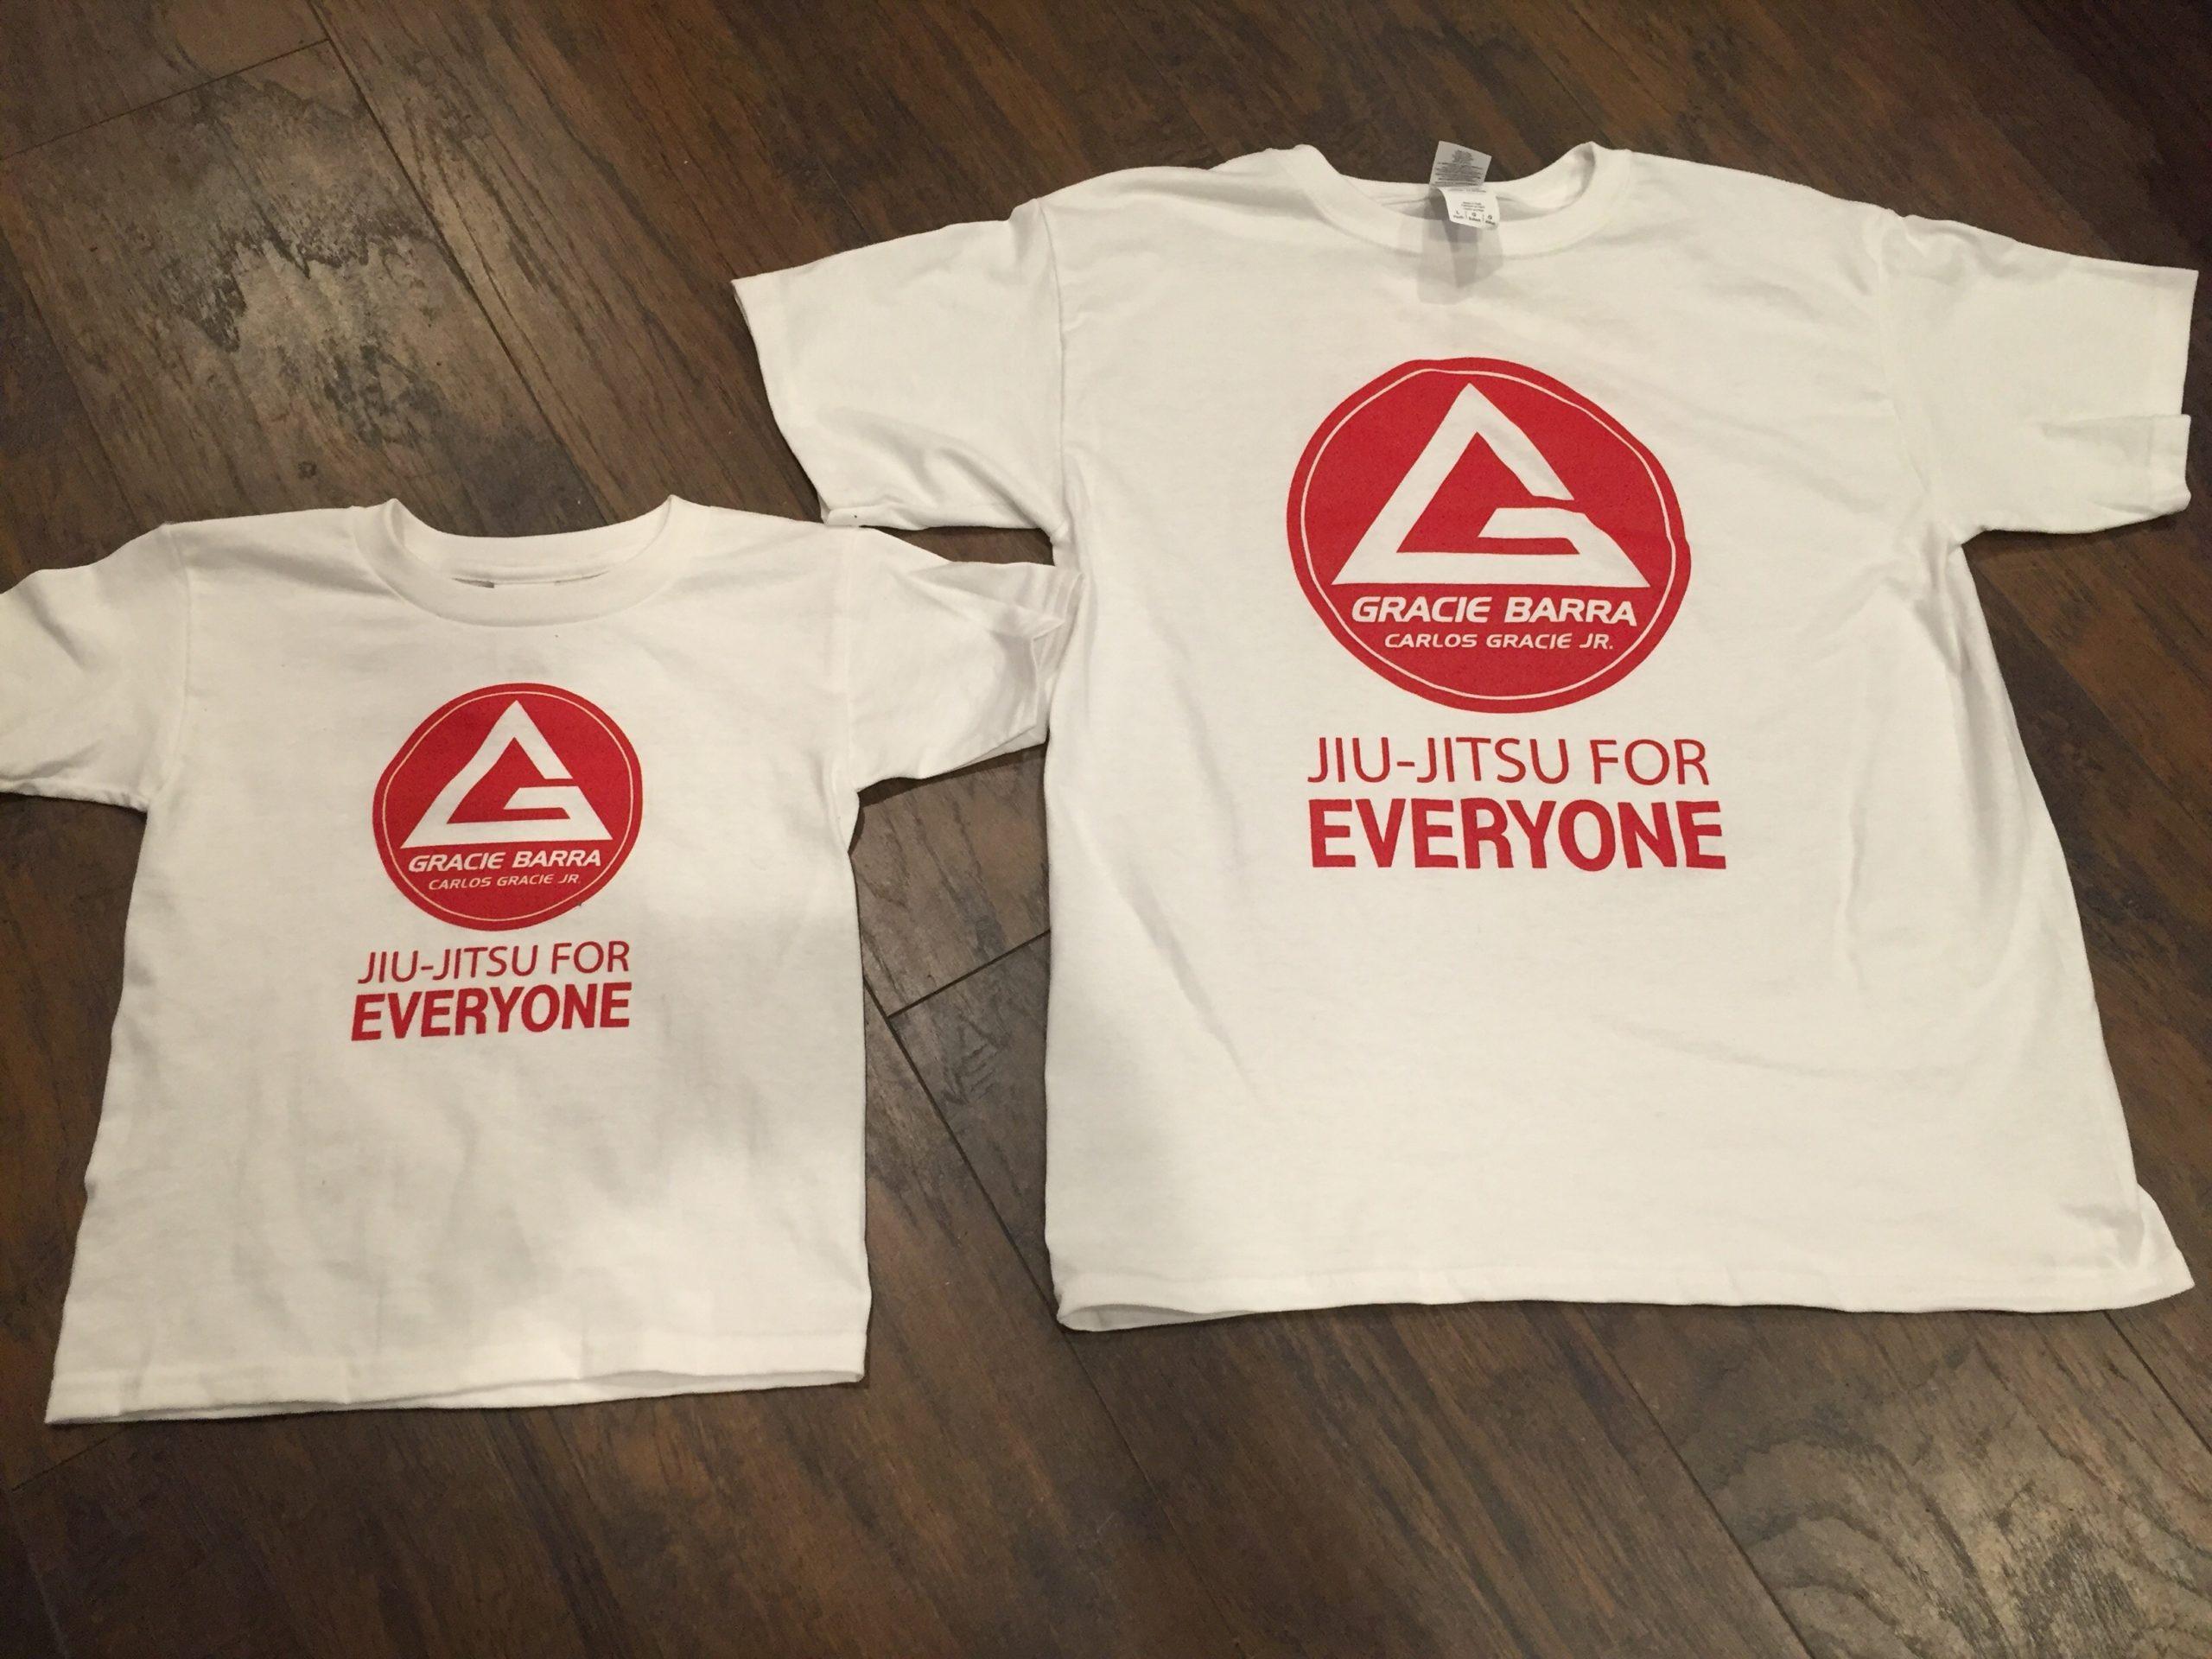 Gracie Barra Promotional T-Shirts